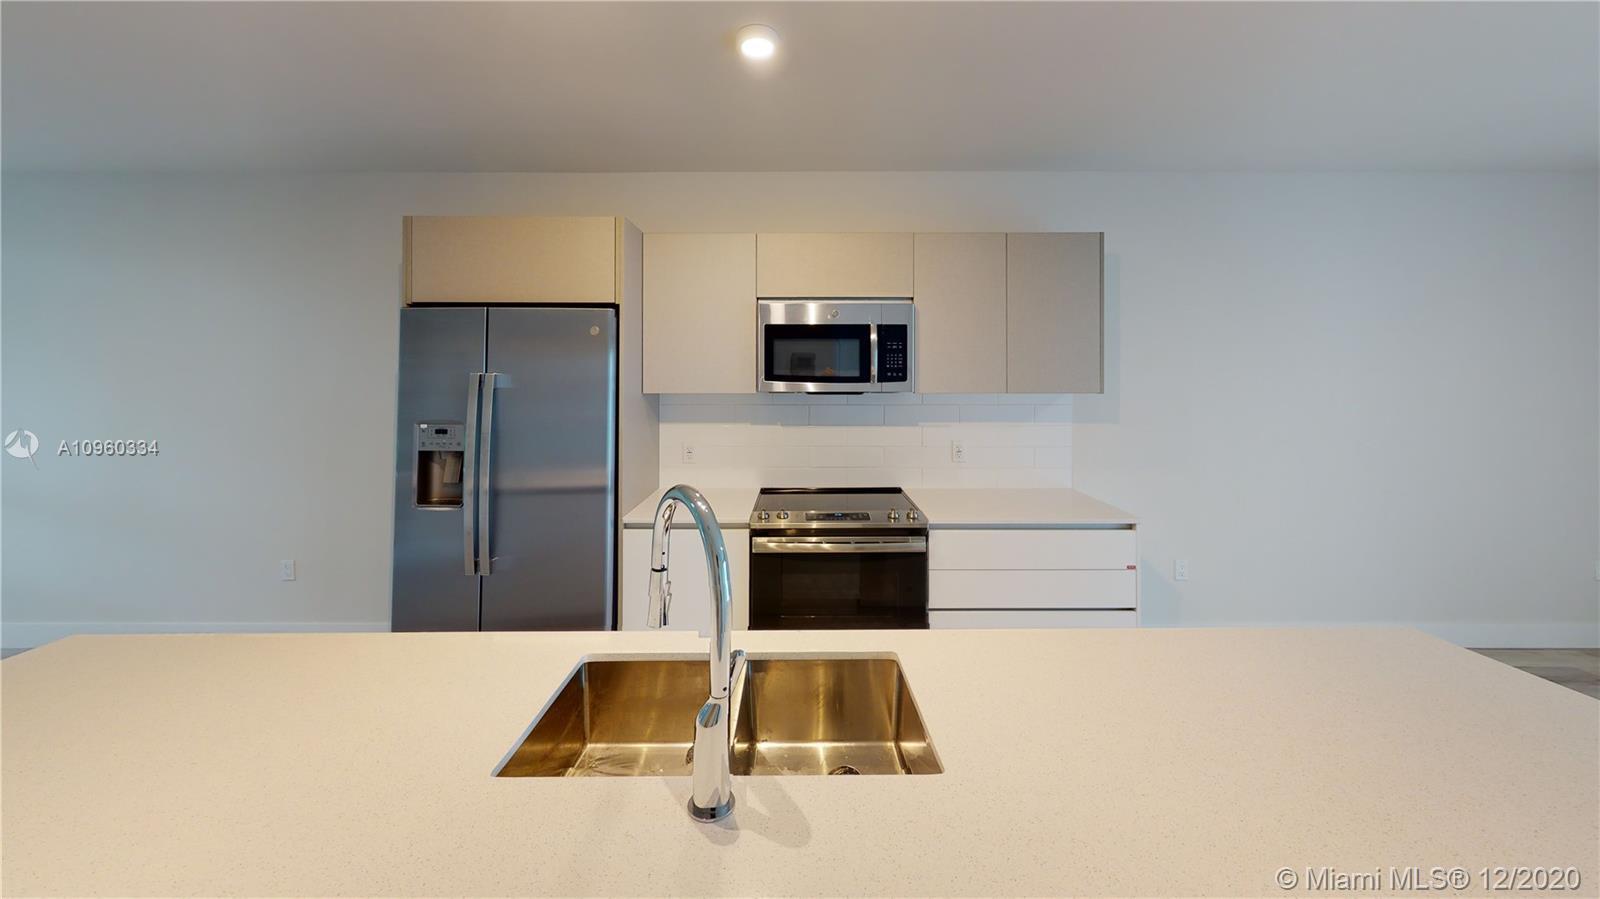 2535 NE 193 Street # 3211, Miami, Florida 33180, 2 Bedrooms Bedrooms, ,3 BathroomsBathrooms,Residential Lease,For Rent,2535 NE 193 Street # 3211,A10960334